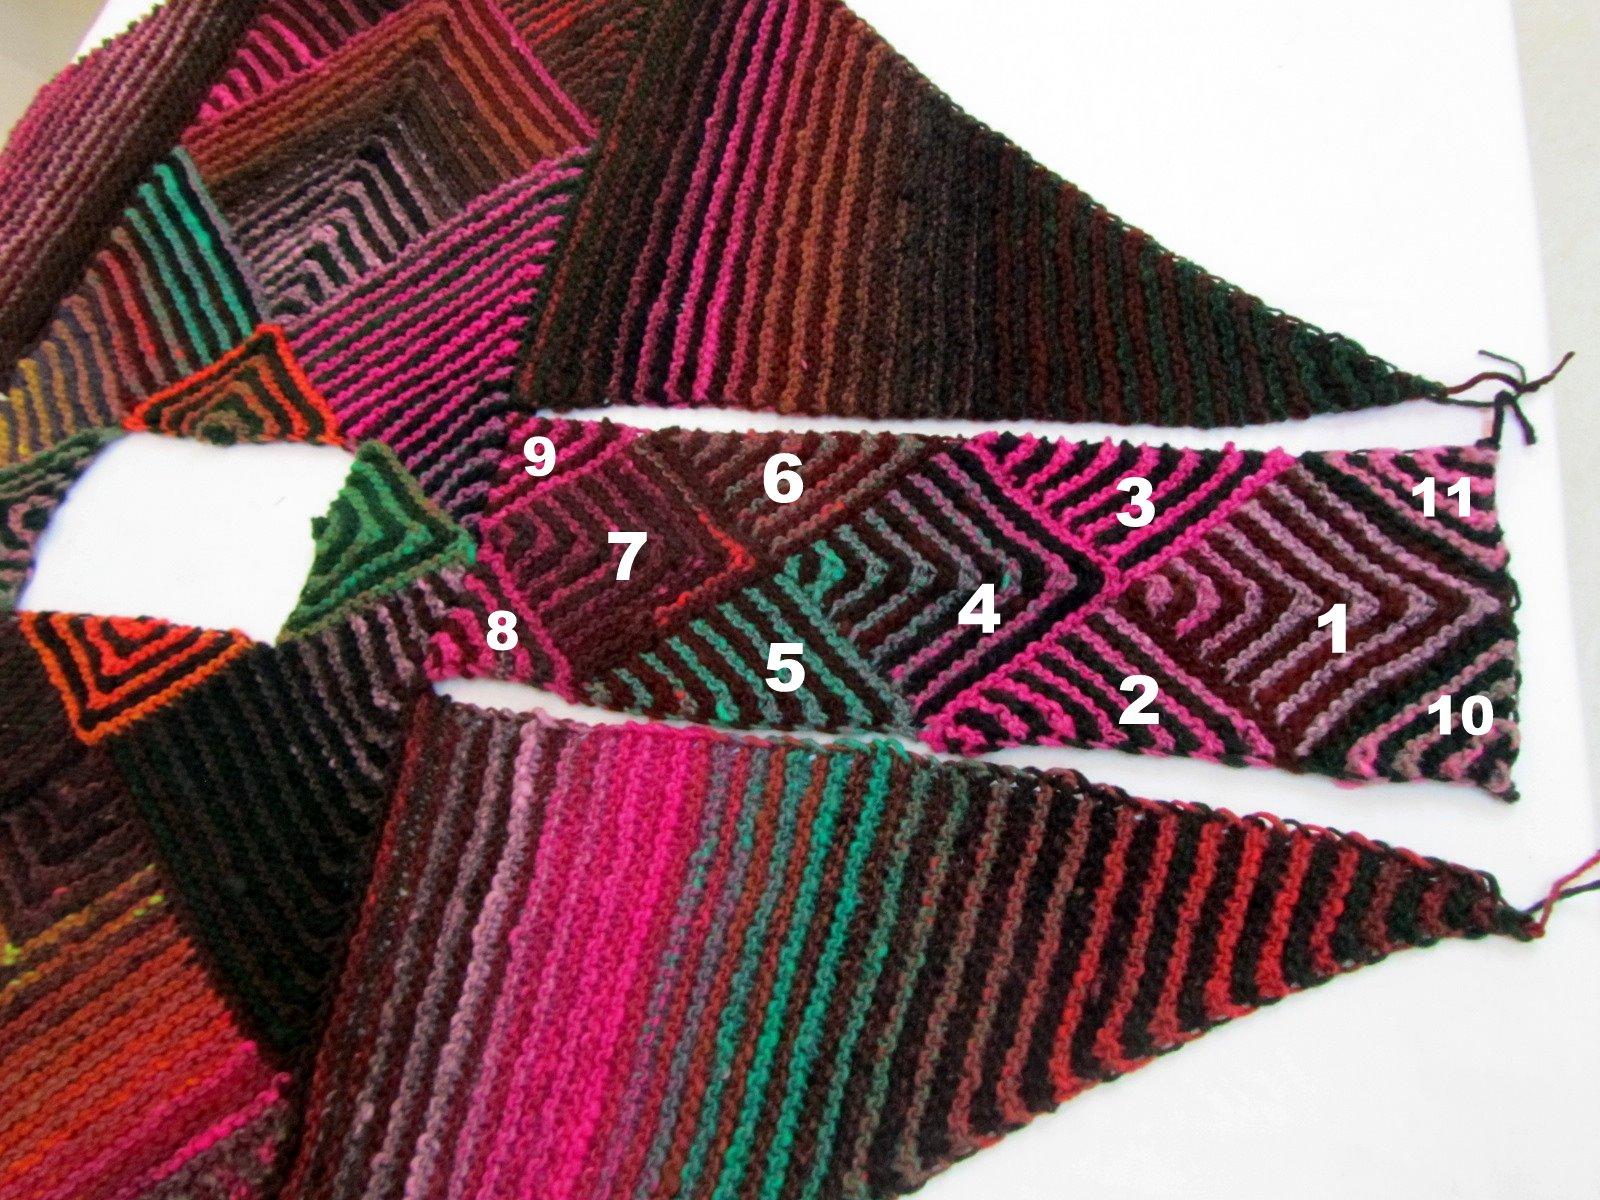 Knitting Pattern Poncho With Sleeves : Fibermania: Poncho #2: Alternate Sleeves